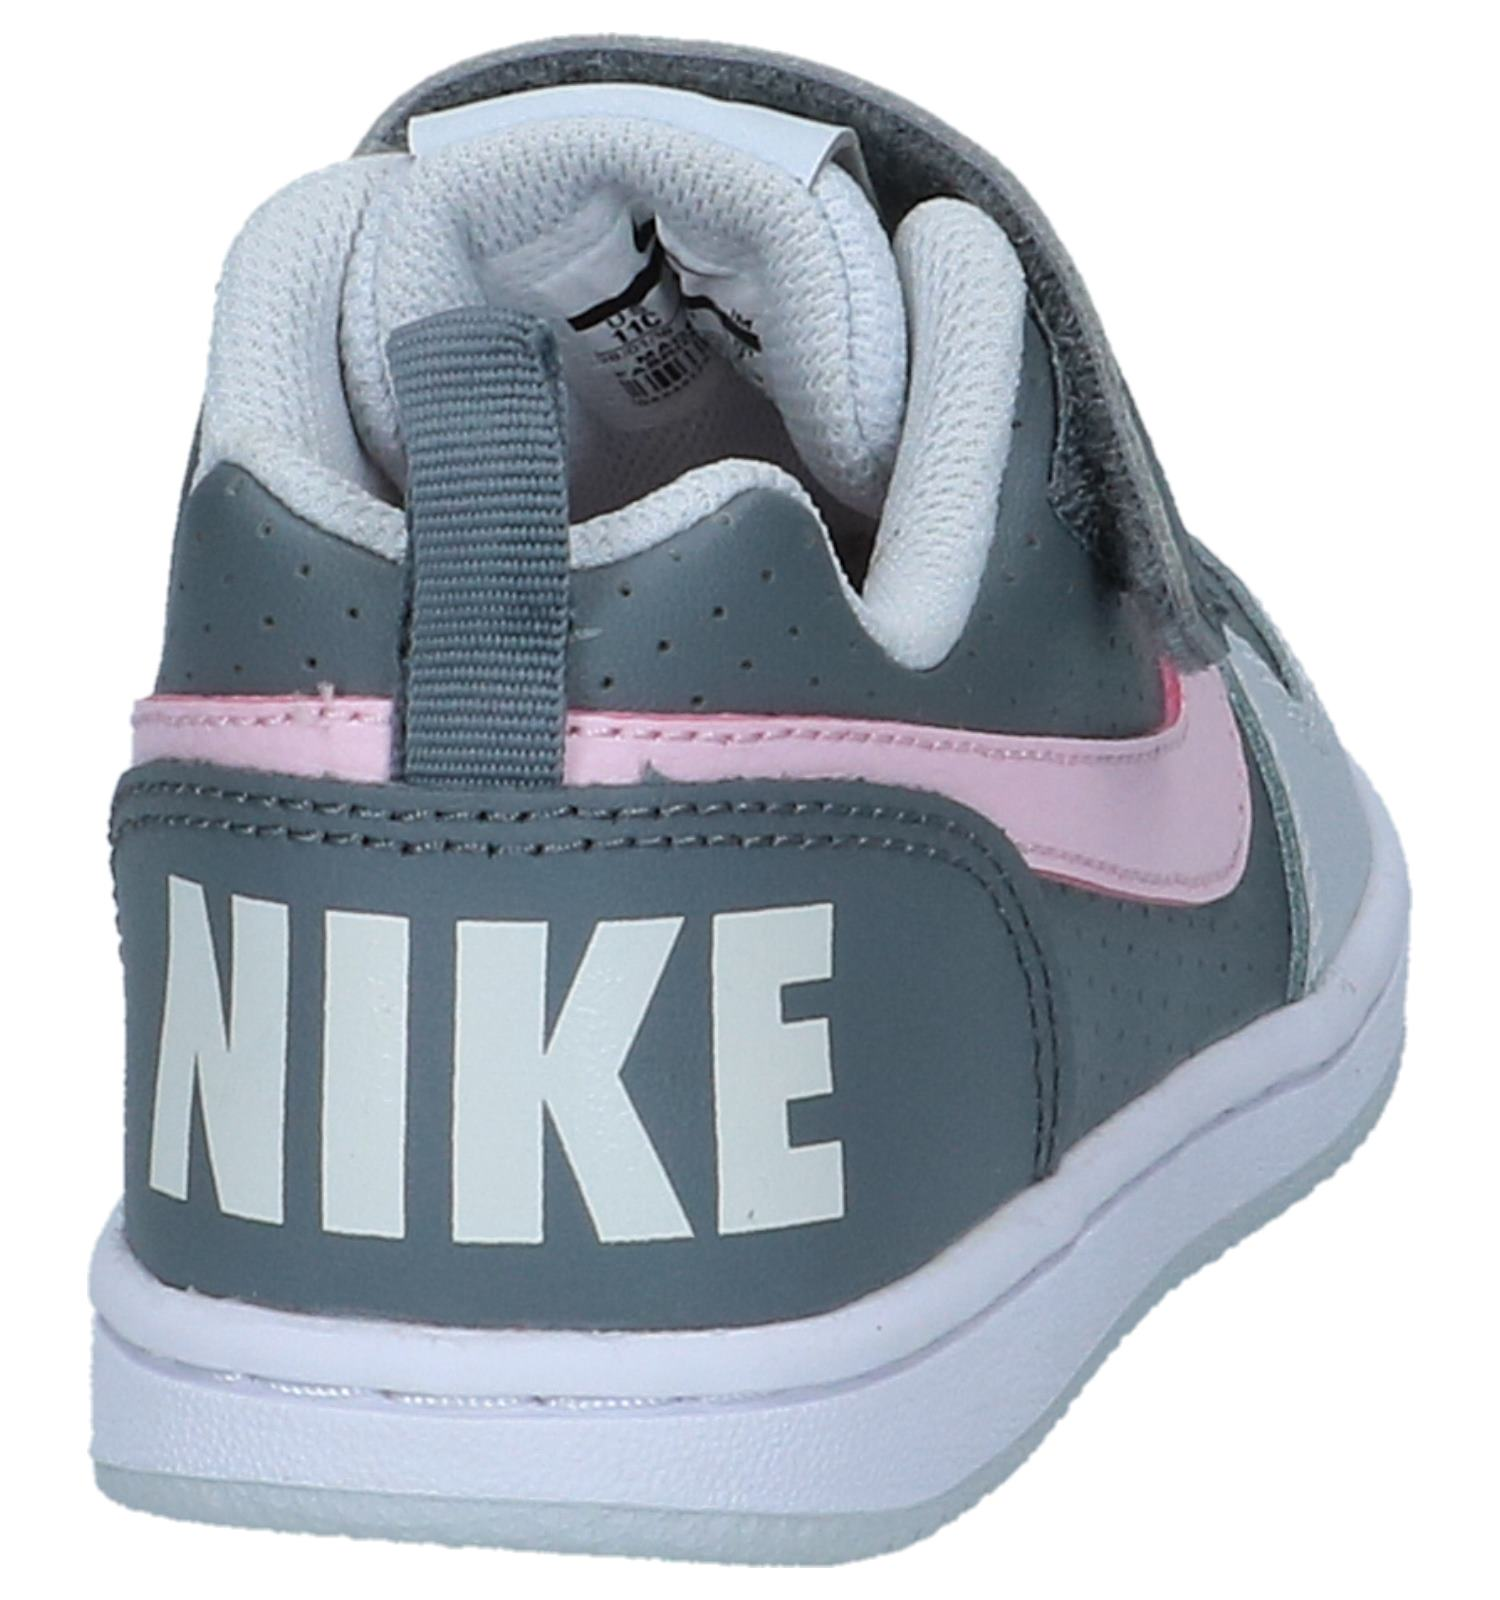 7fb83bb1f88 Grijze Sneakers Nike Court Borough Low | TORFS.BE | Gratis verzend en retour